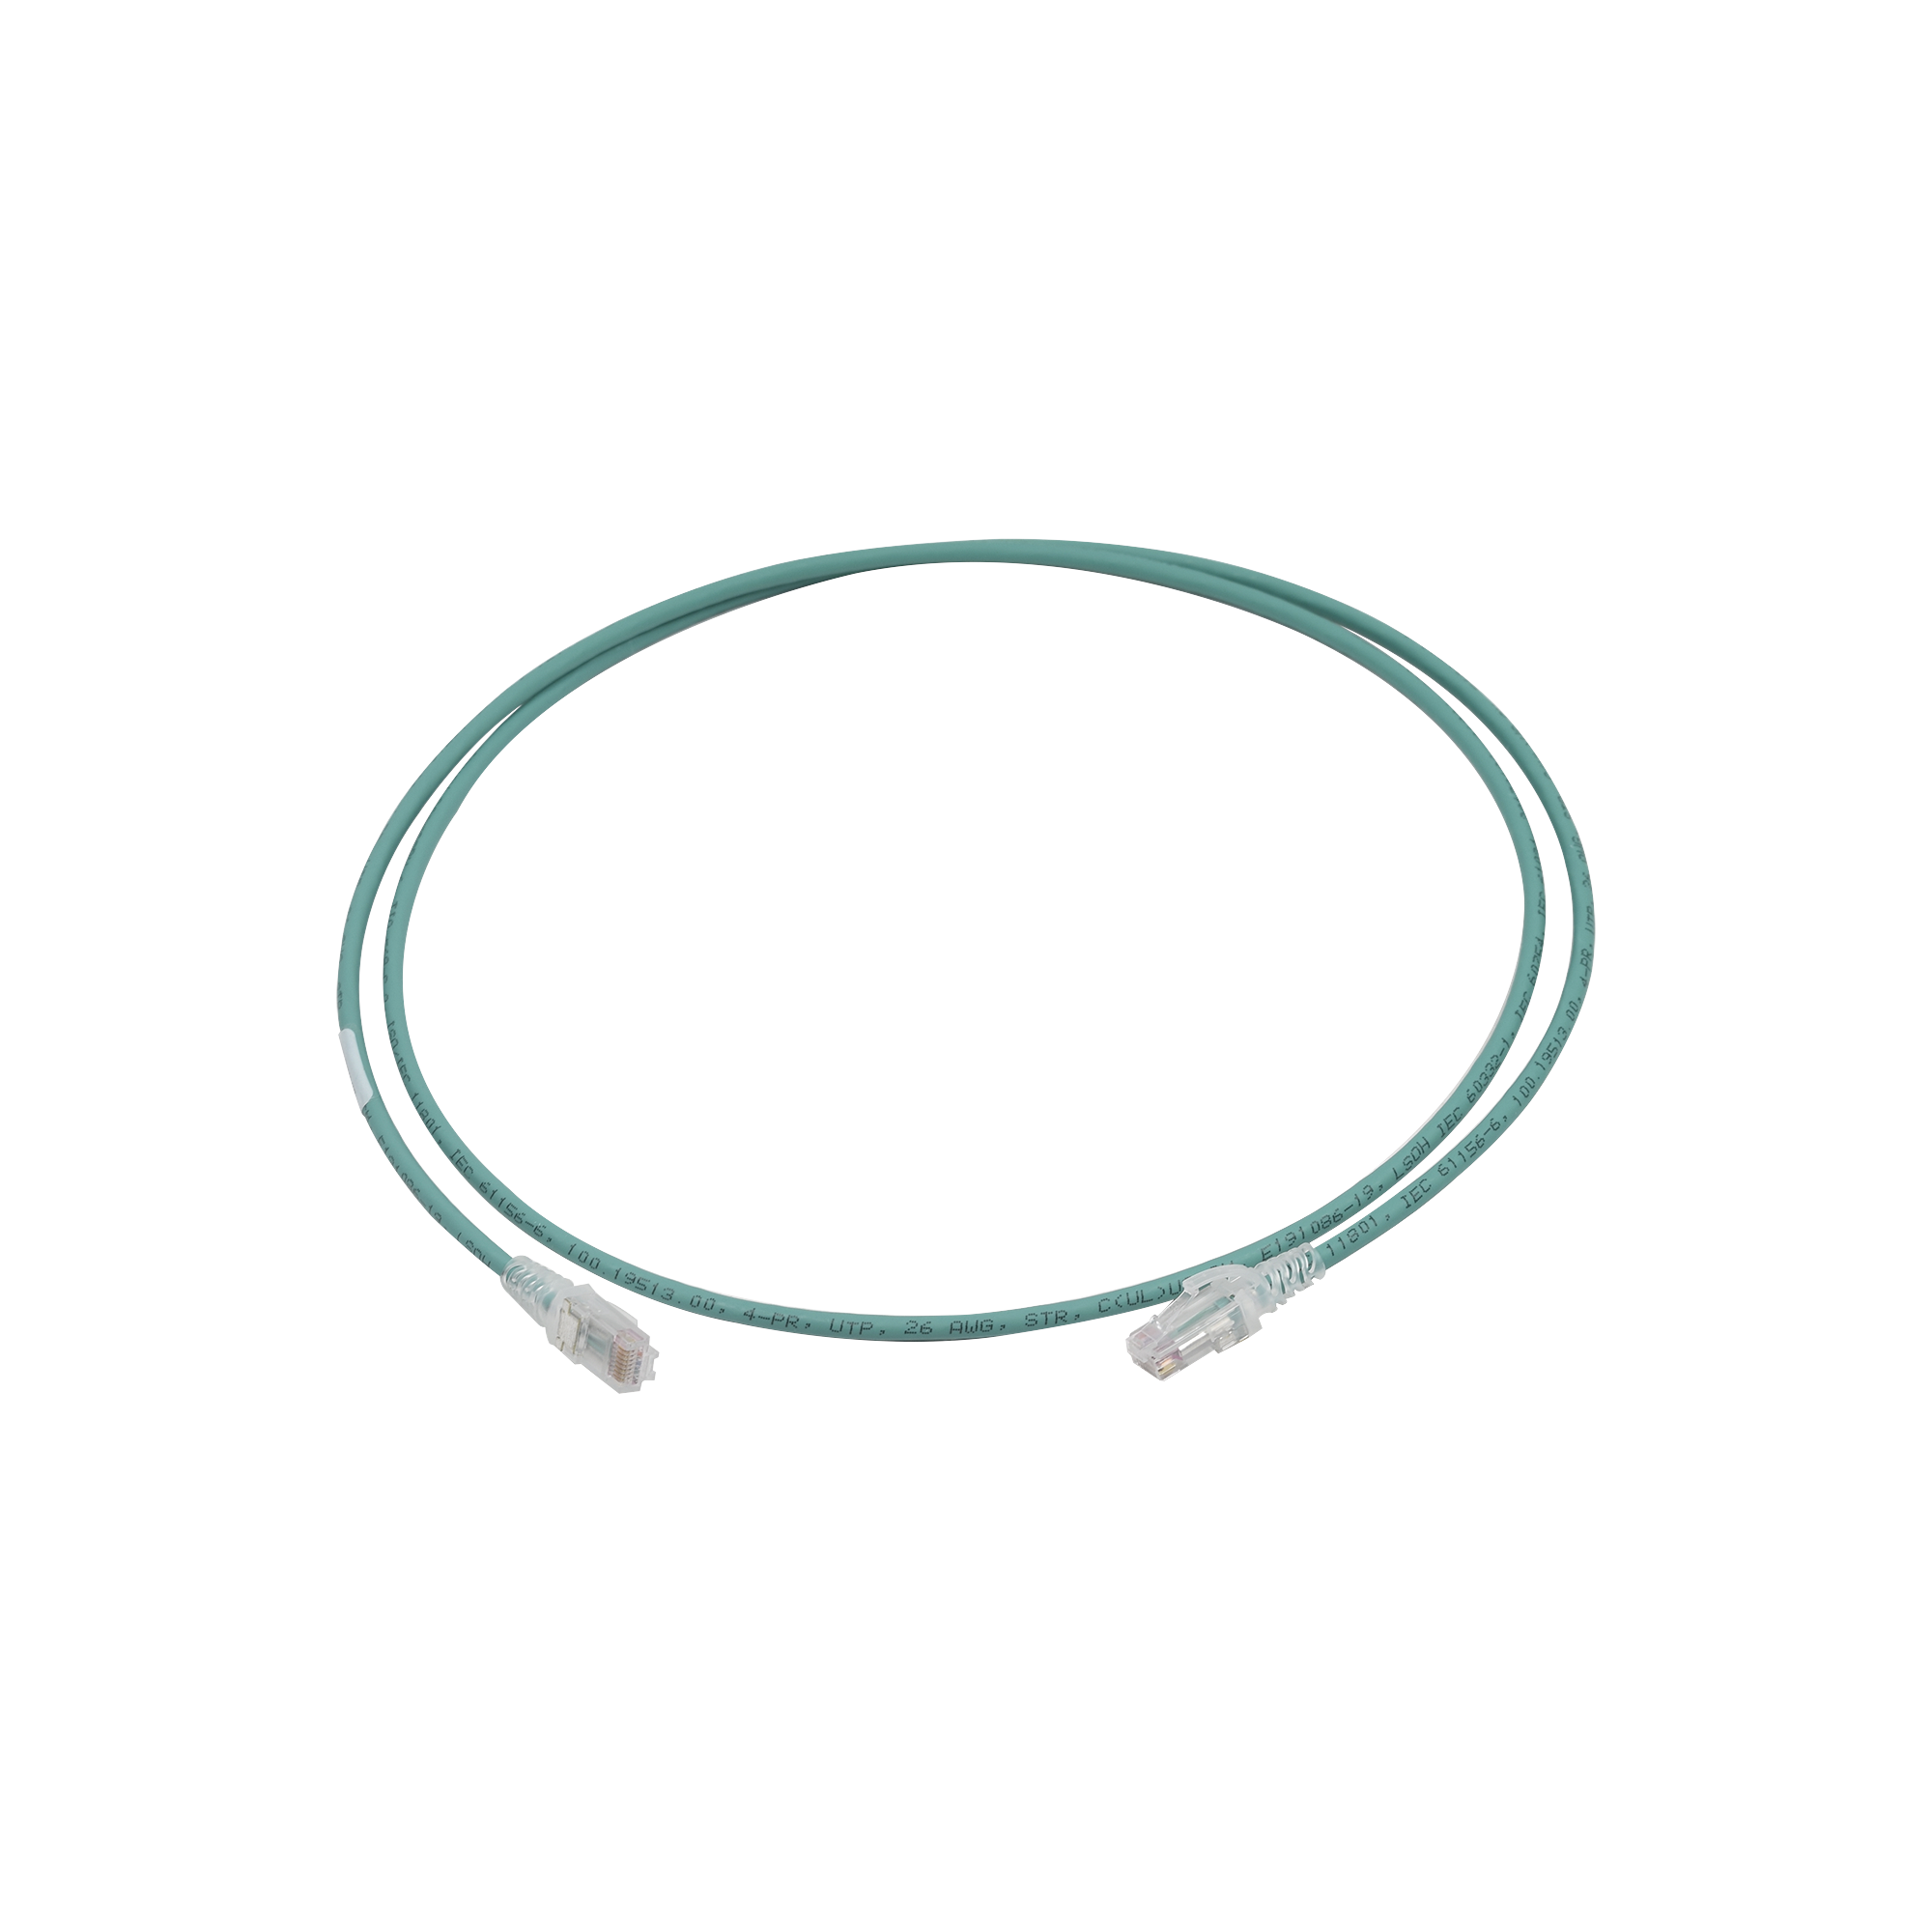 Patch Cord MC6 Modular Cat6 UTP, CM/LS0H, 5ft, Color Verde